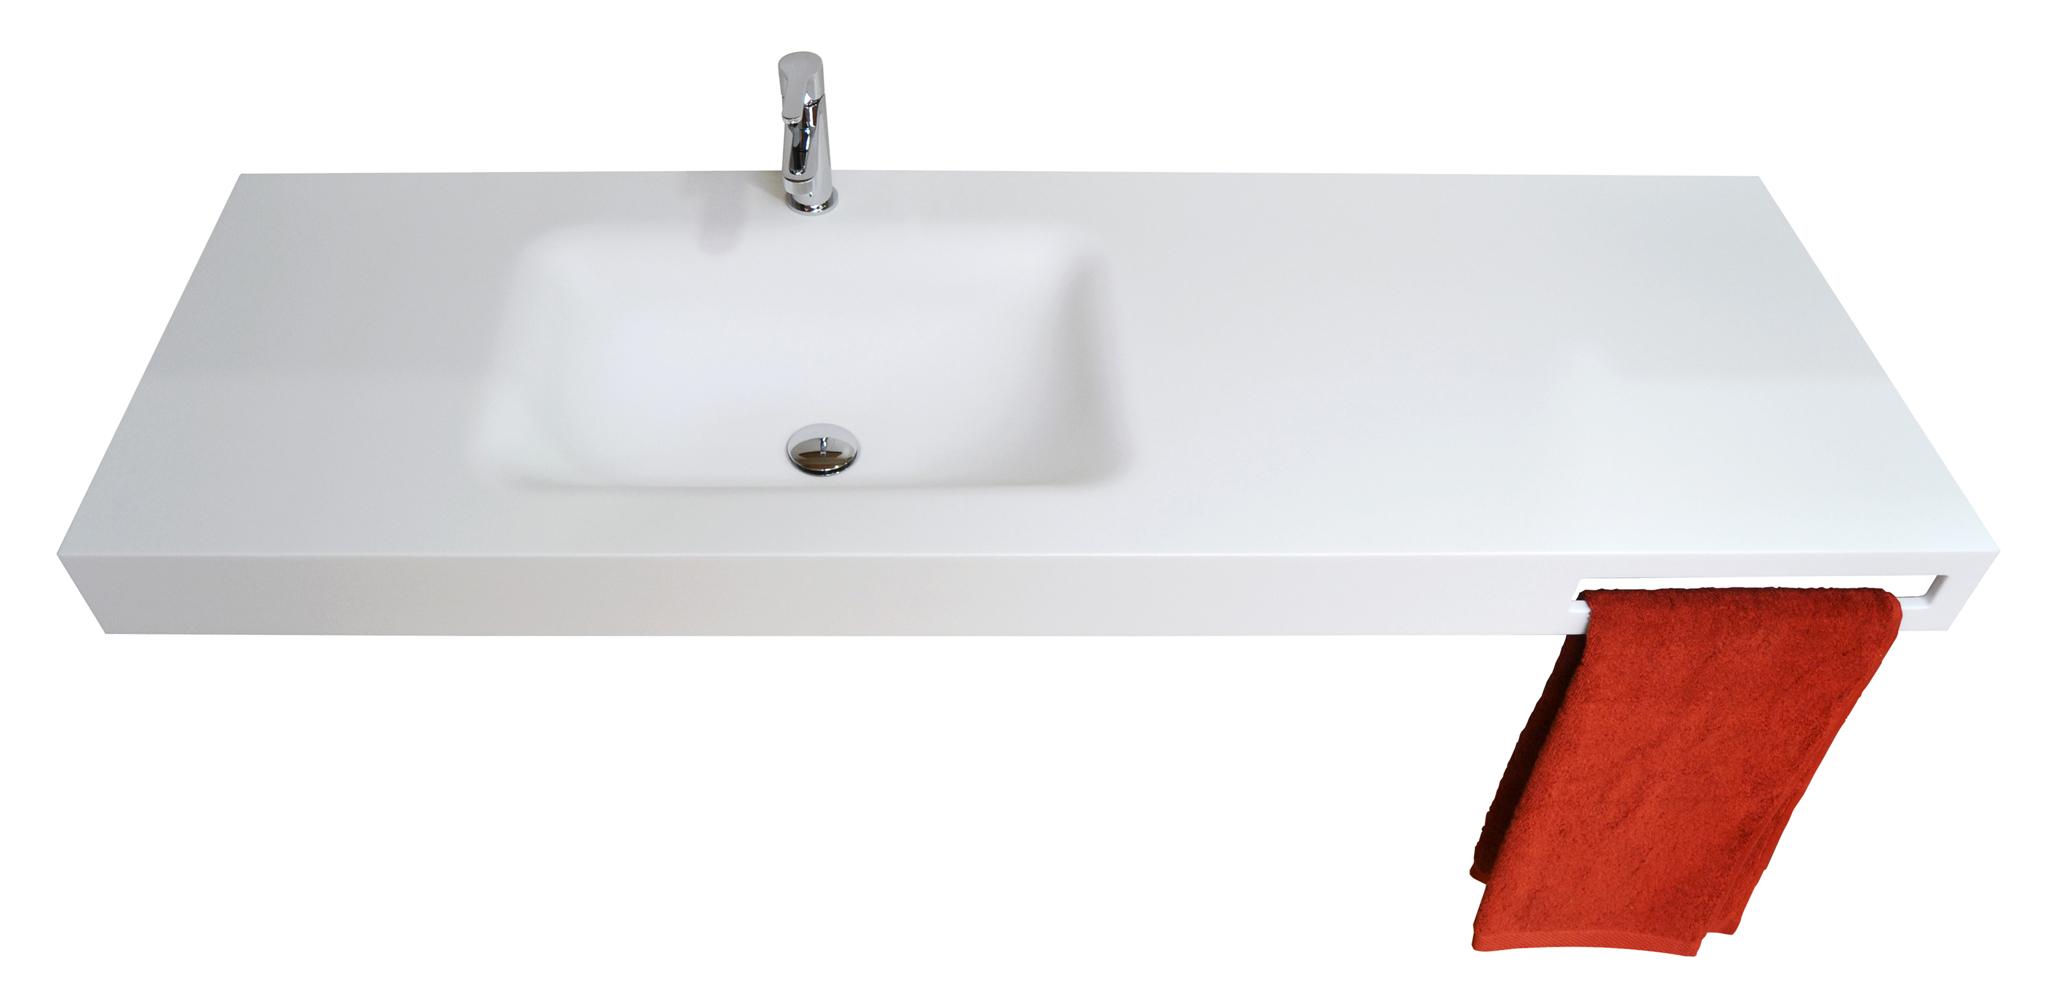 lavabo-encimera-corian